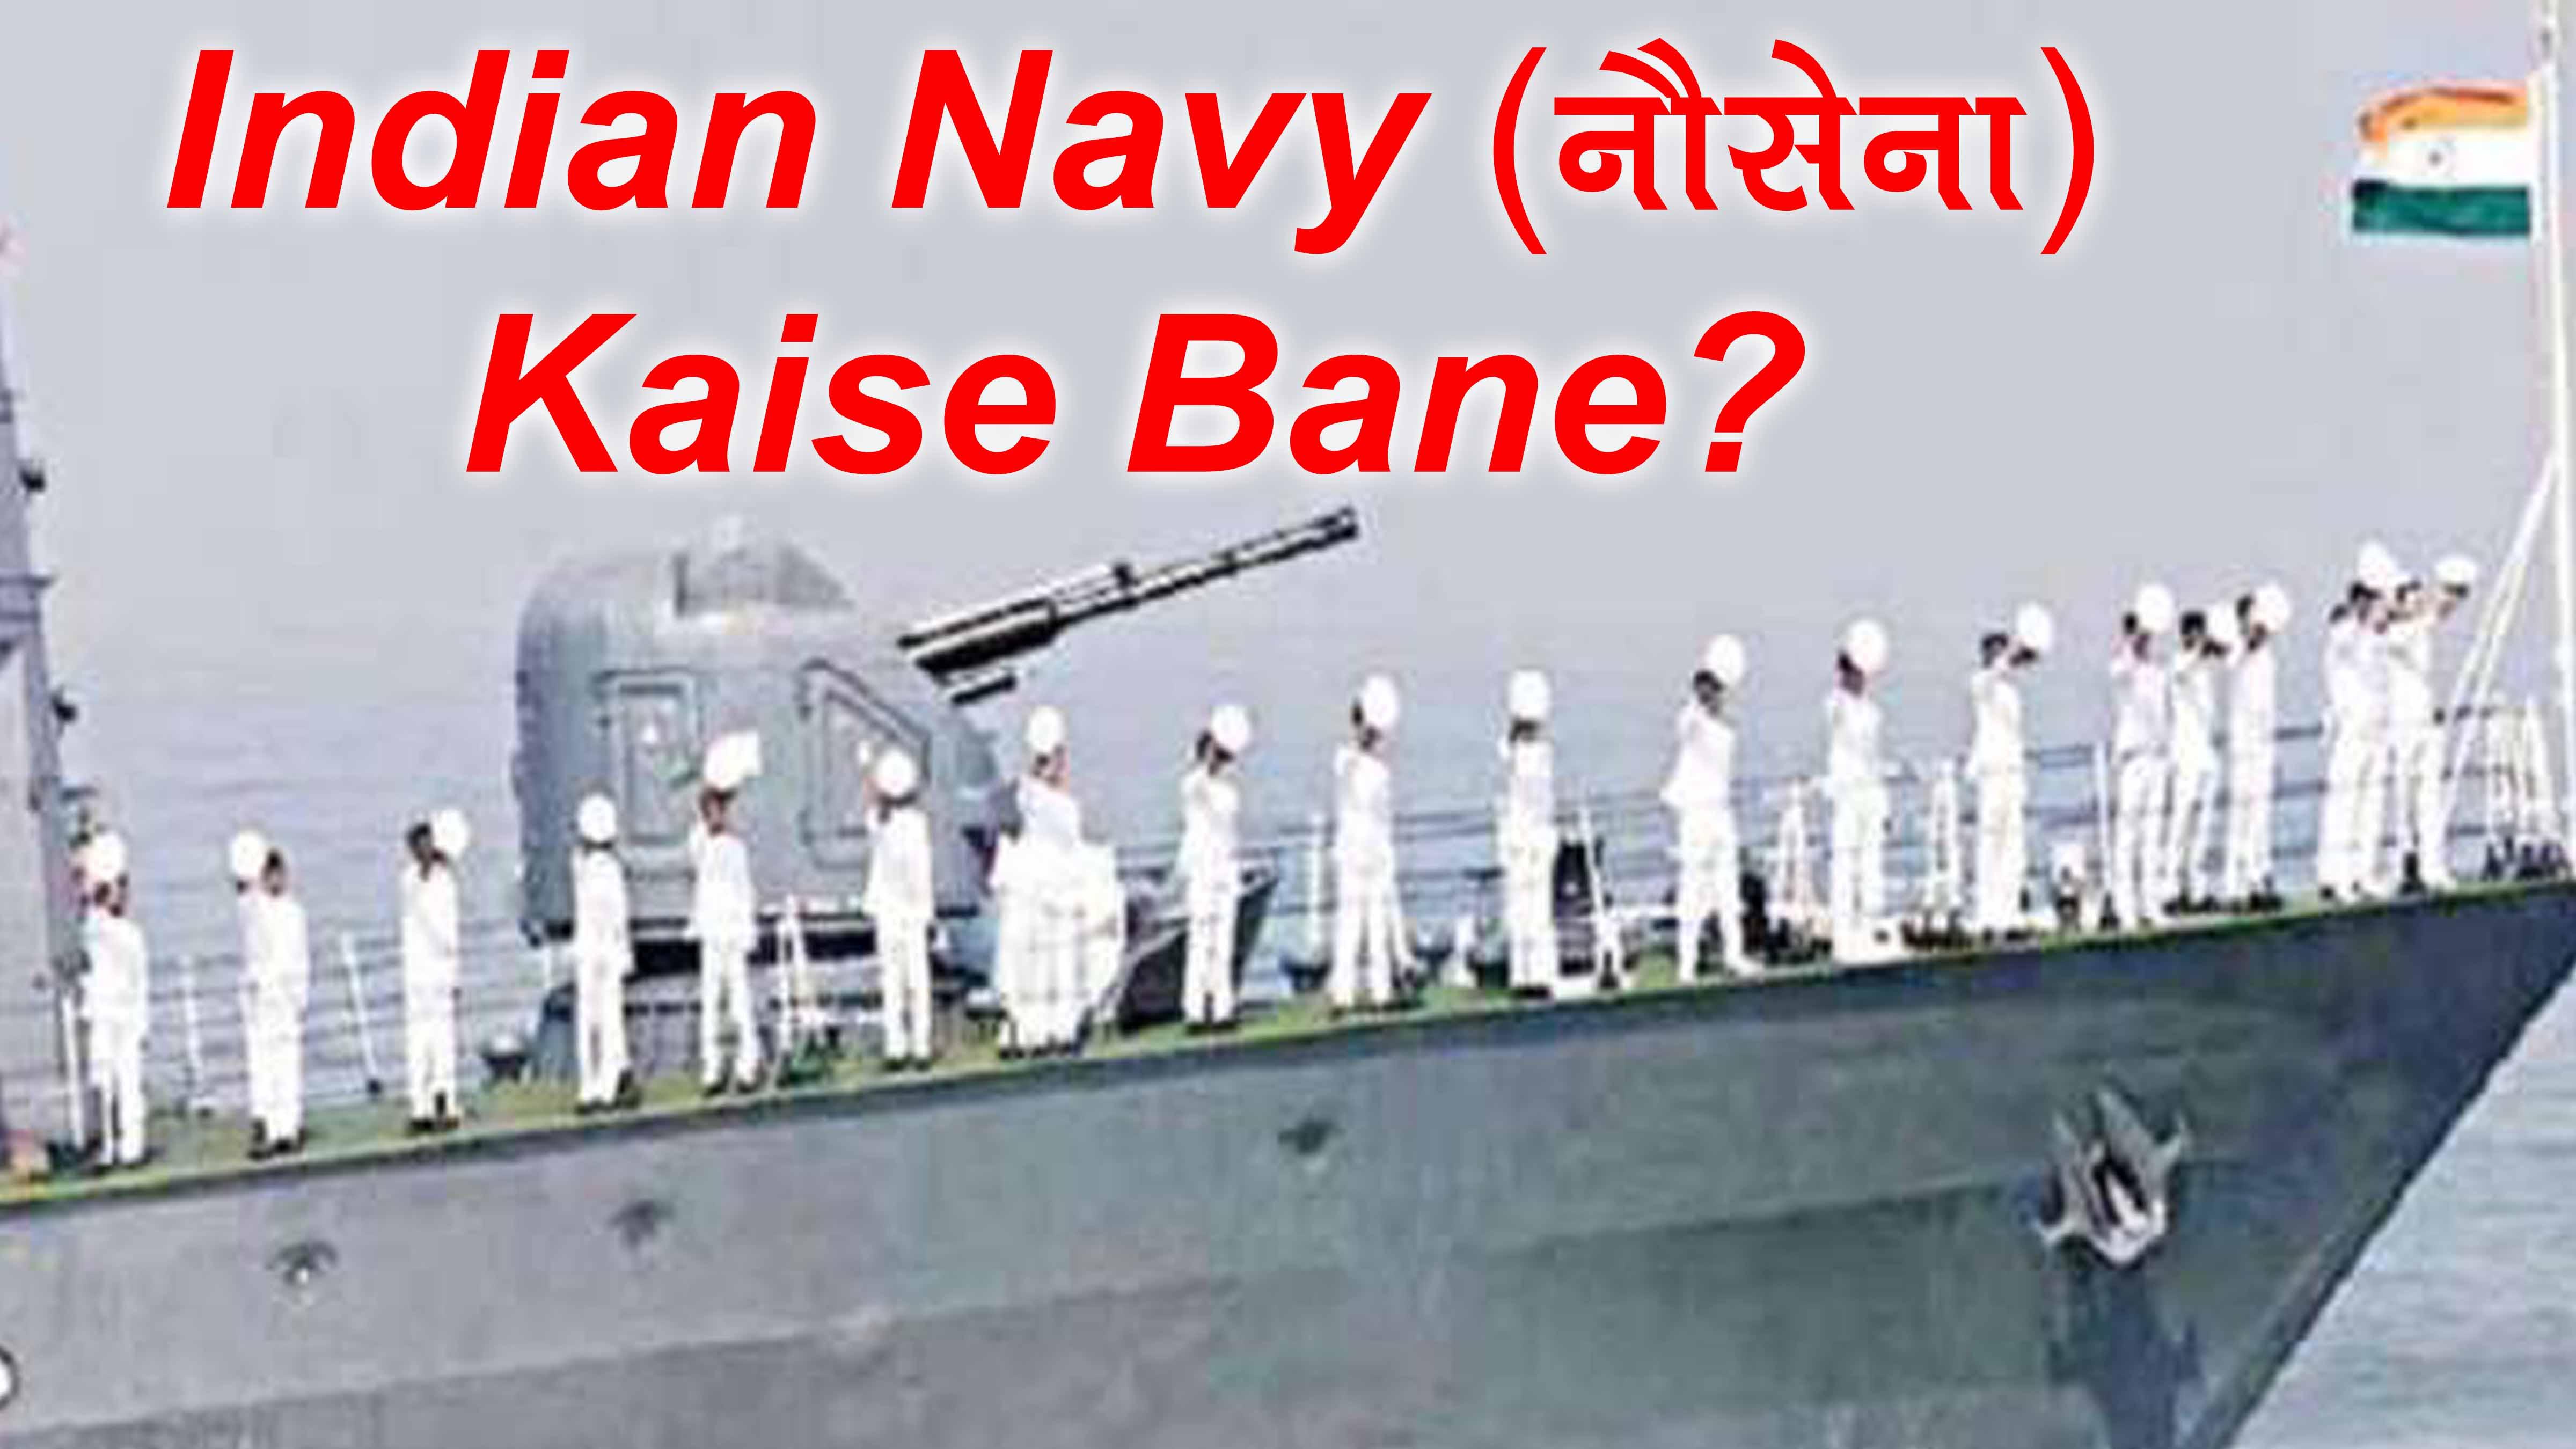 Indian Navy Kaise Bane